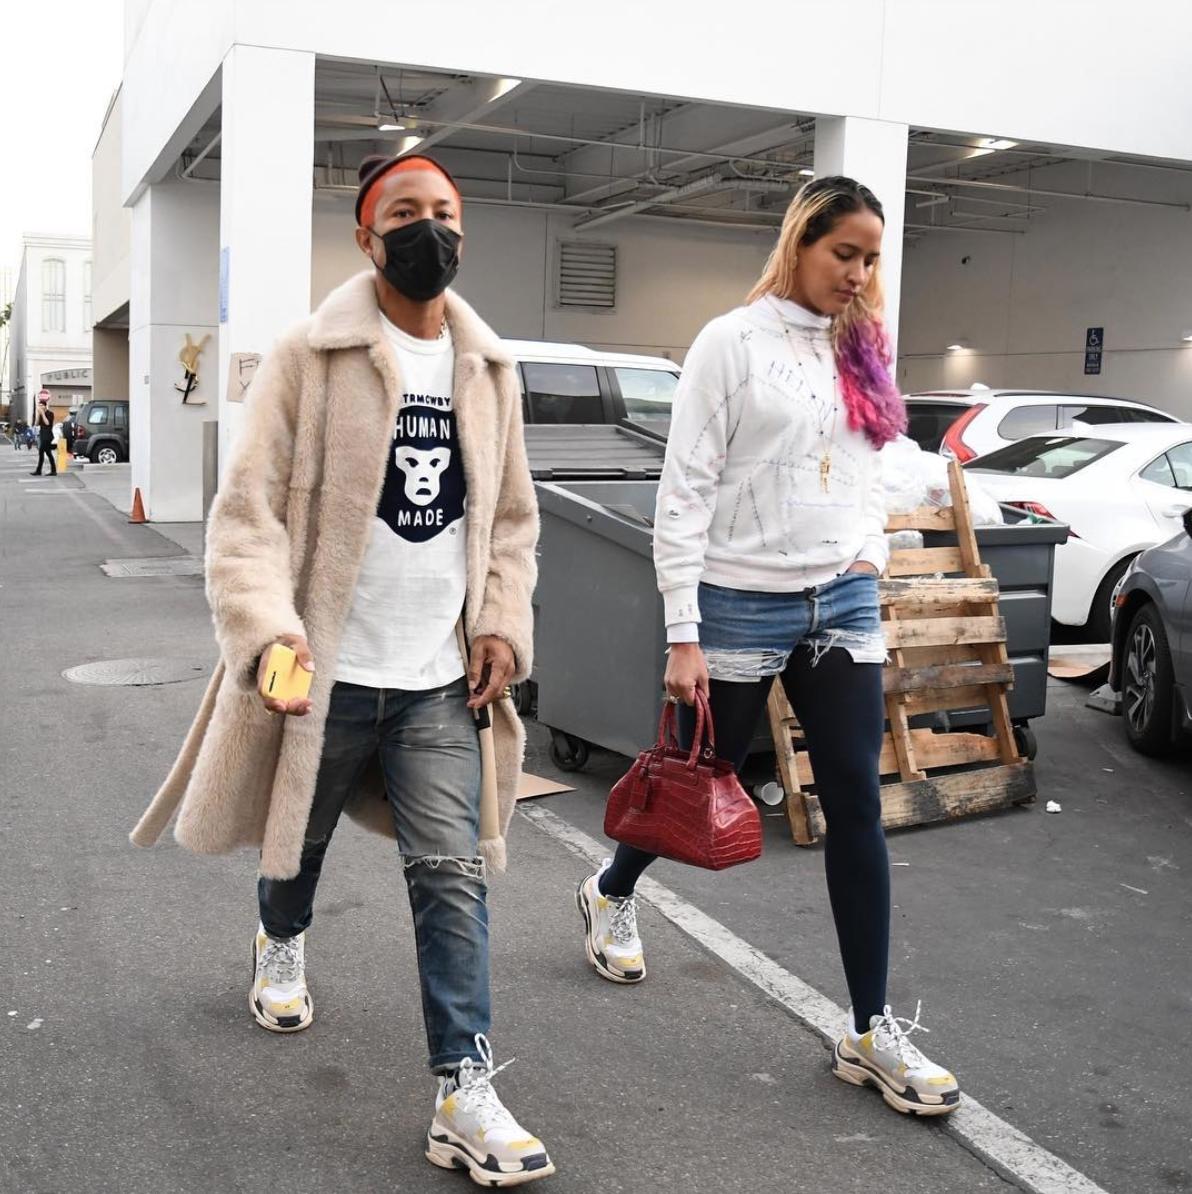 Balenciaga, Off white, Nike, Bape, Air Jordan and Other